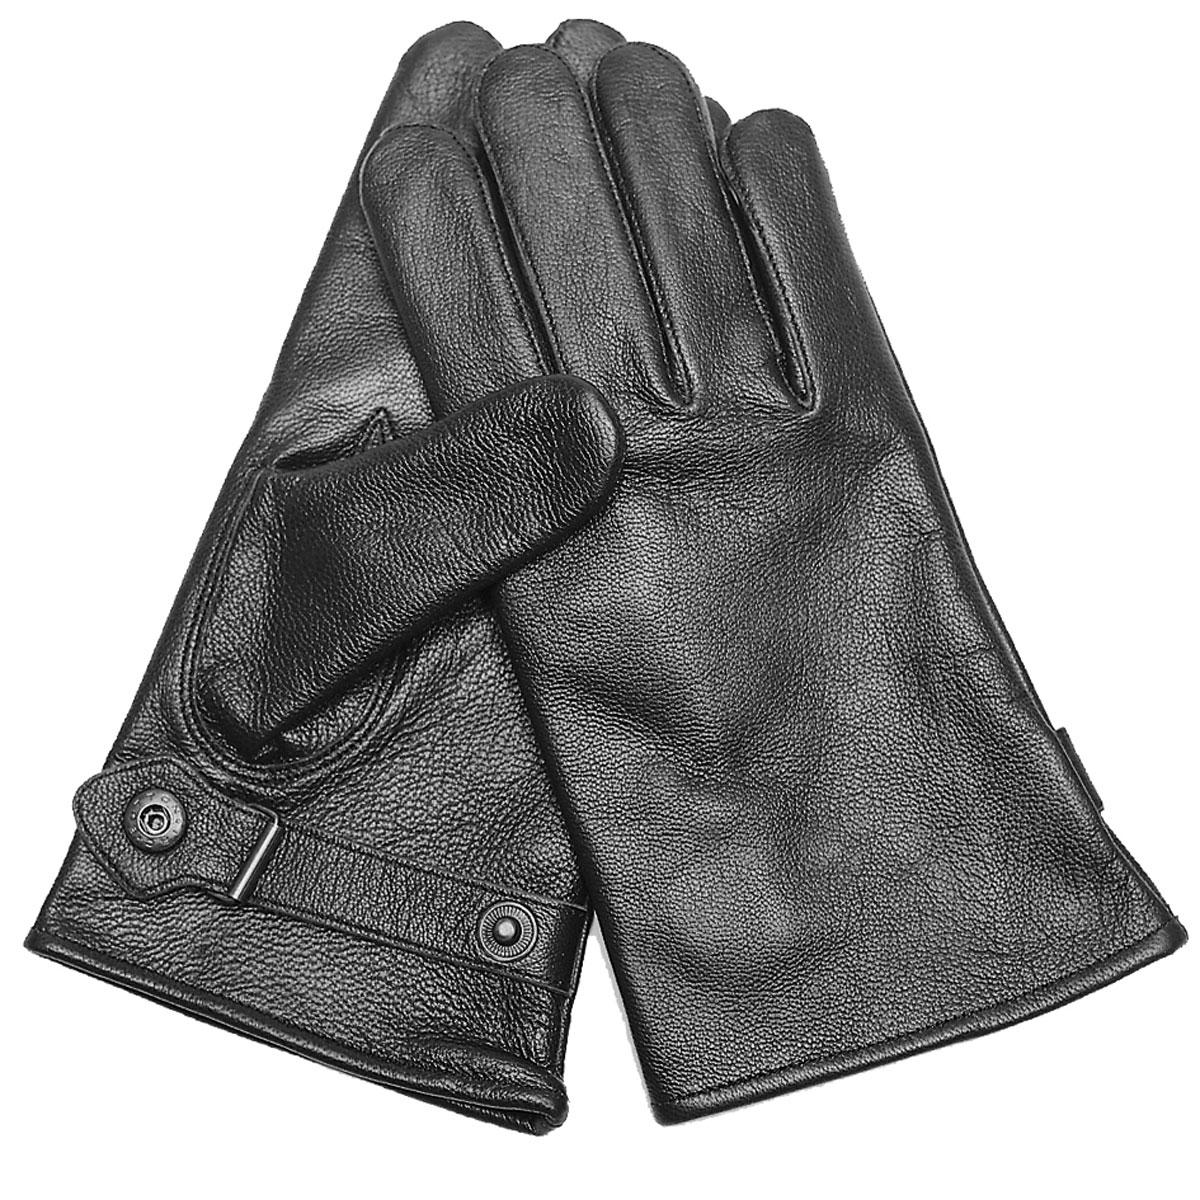 BW Lederhandschuhe schwarz